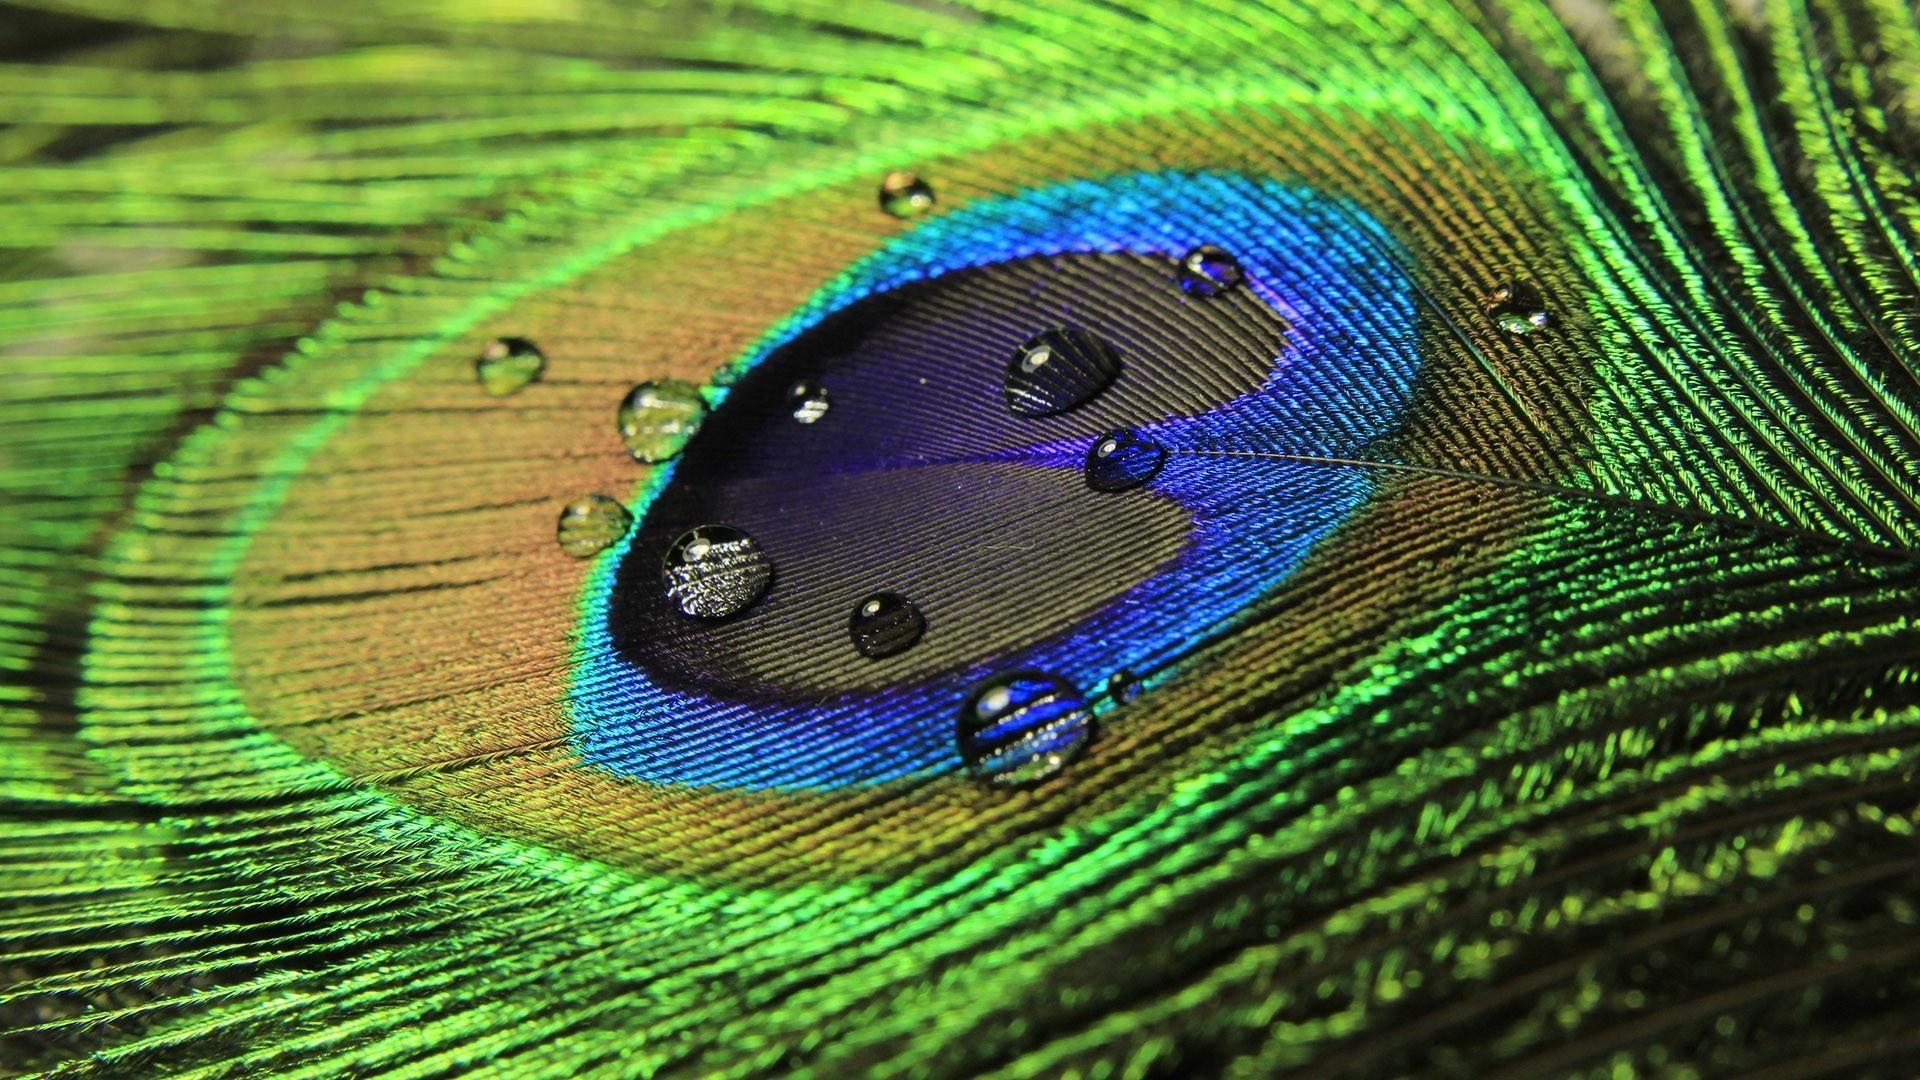 Raindrops Hd Desktopmobile Wallpapers Page 1